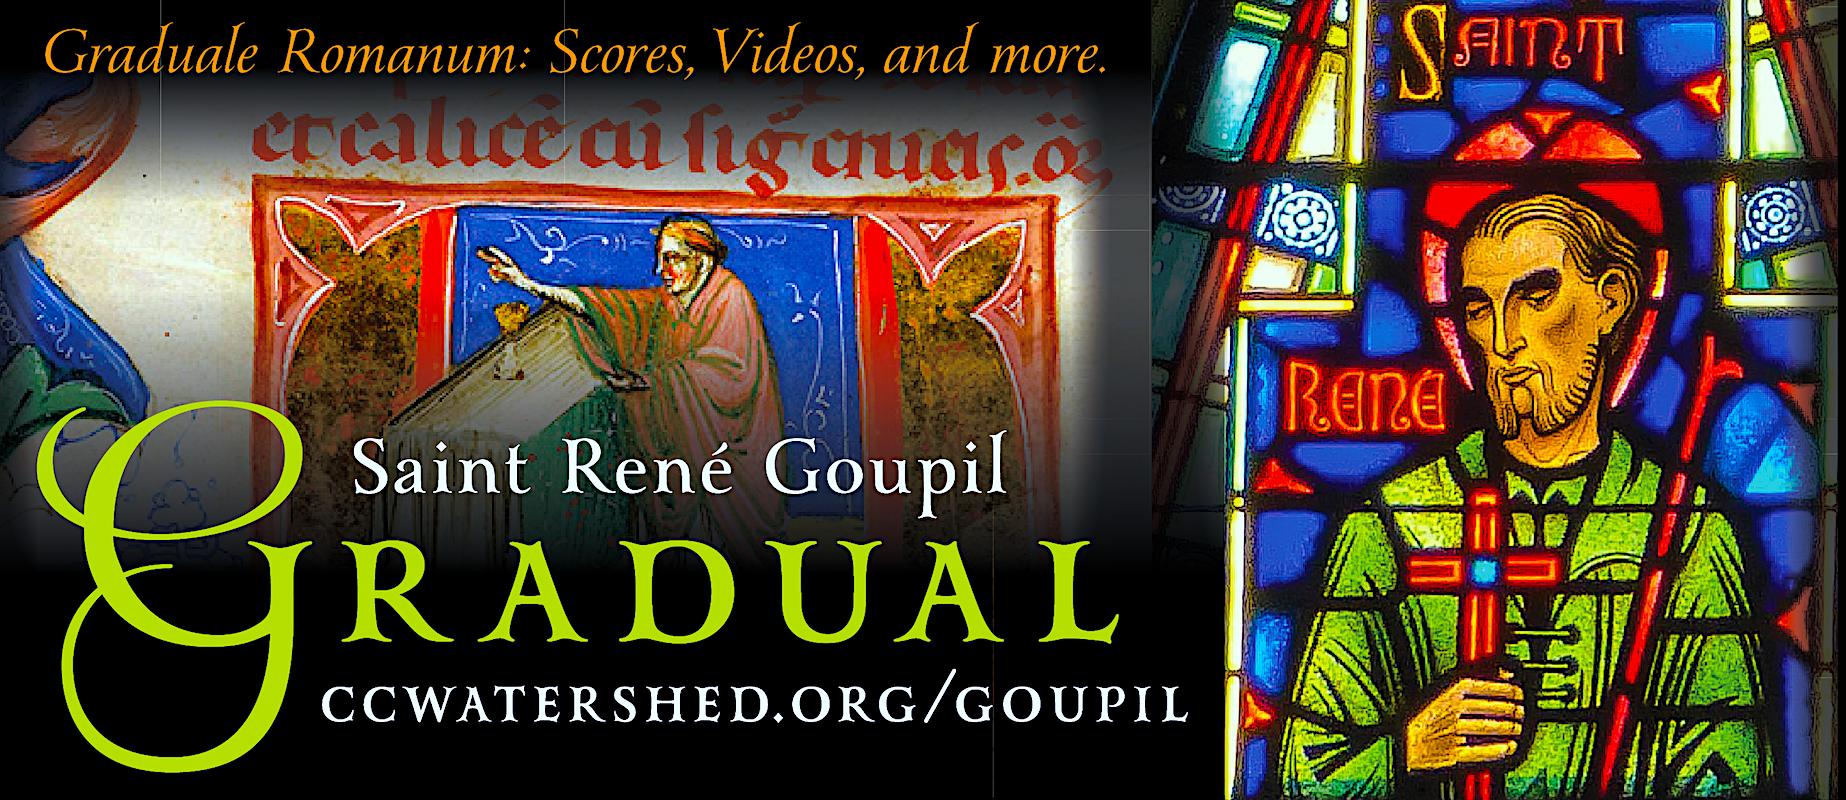 Saint René Goupil • Gregorian Chant Propers